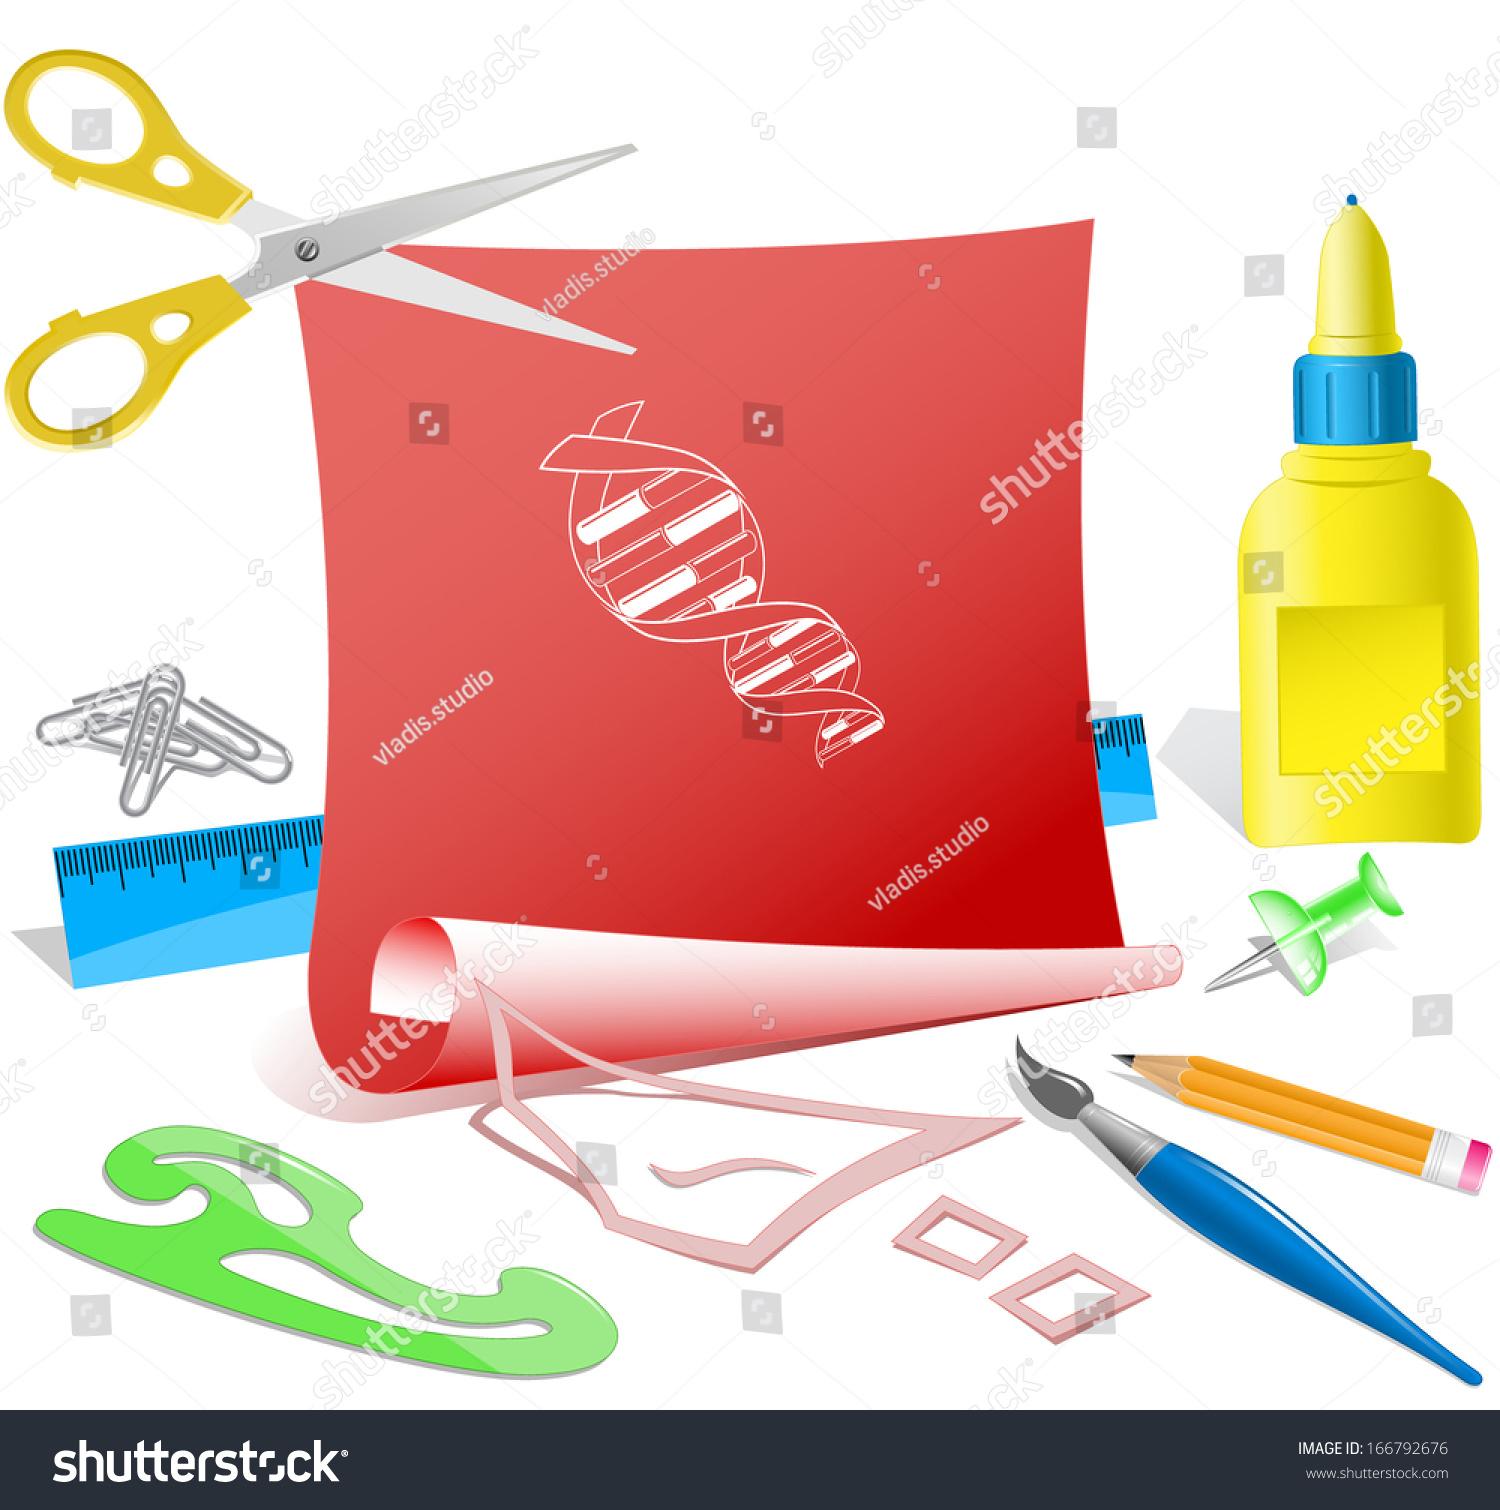 DNA Paper Template Raster Illustration Stock Illustration 166792676 ...